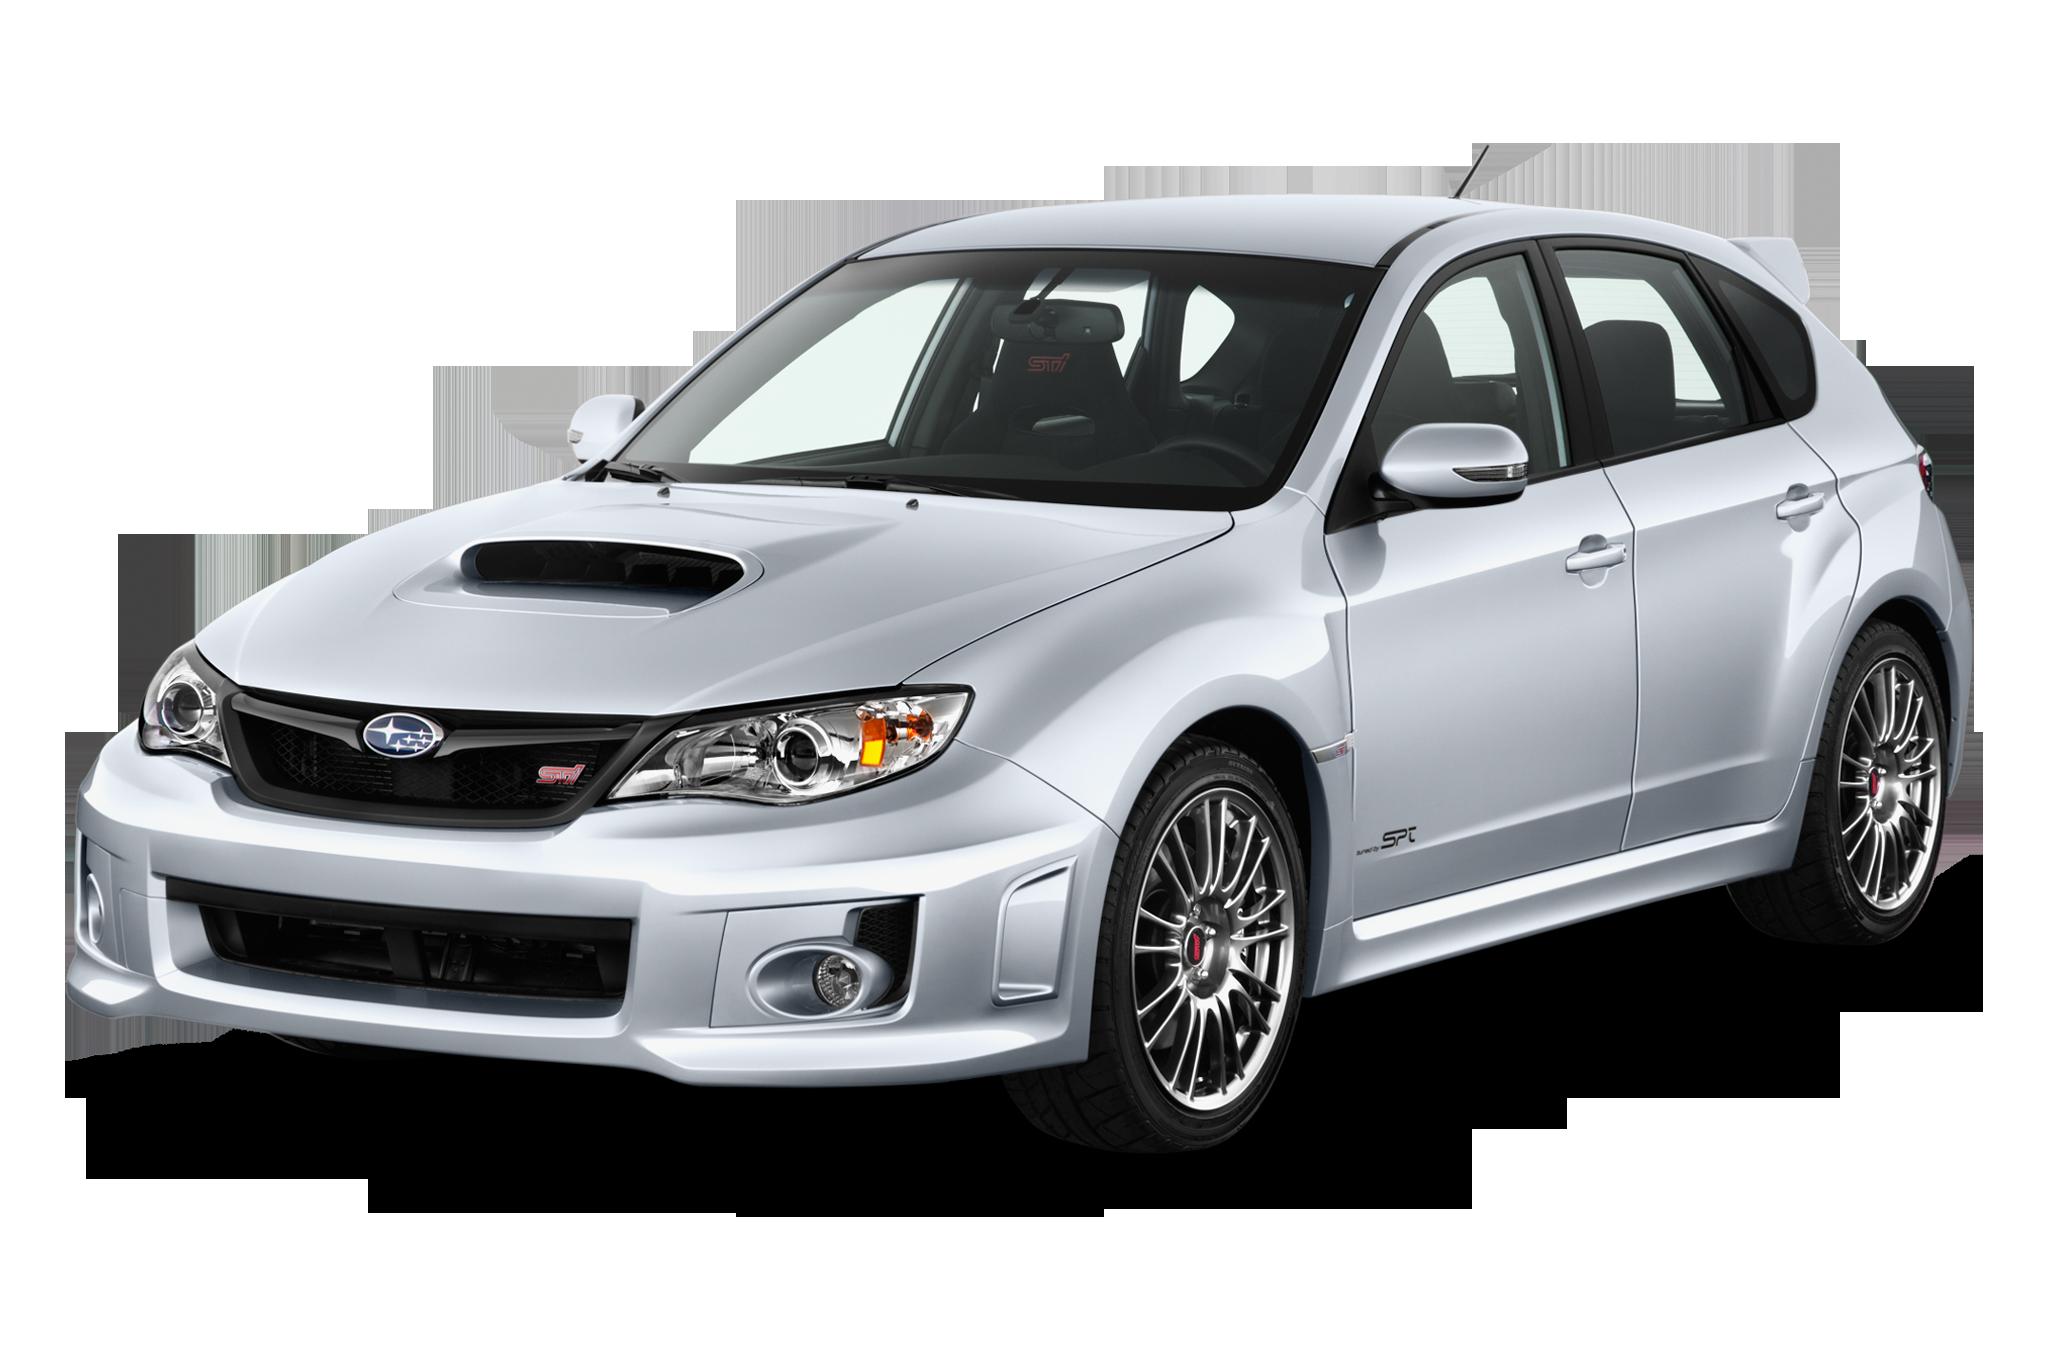 2014 Subaru Impreza, 2014 Volvo XC90 Rated Top Safety Pick +